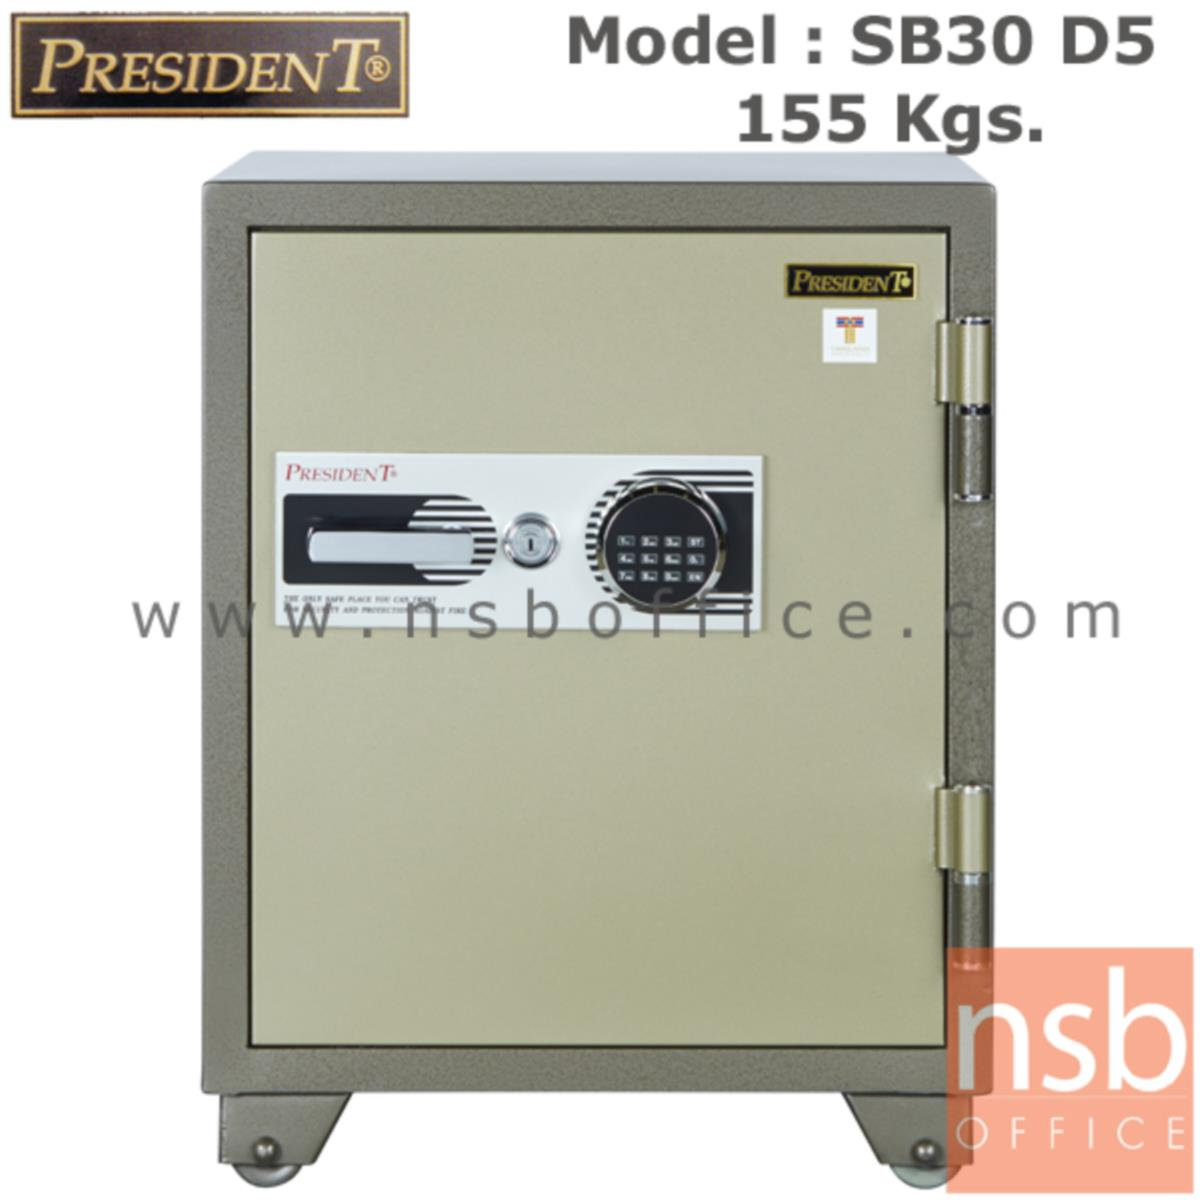 F05A061:ตู้เซฟนิรภัยชนิดดิจิตอลแบบใหม่ 155 กก. รุ่น PRESIDENT-SB30D5 มี 1 กุญแจ 1 รหัส (รหัสใช้กดหน้าตู้)